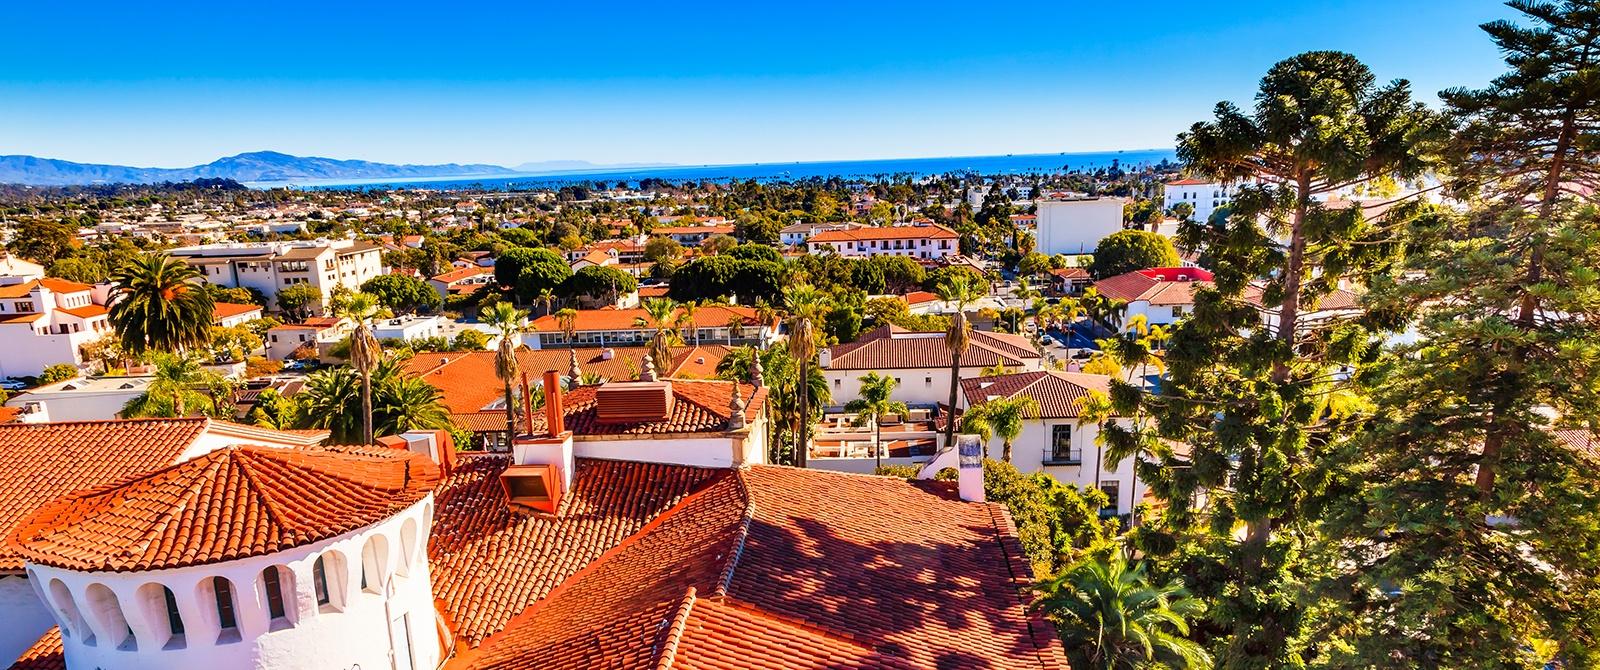 Where is Santa Barbara Wine Country? - Santa Barbara Wine